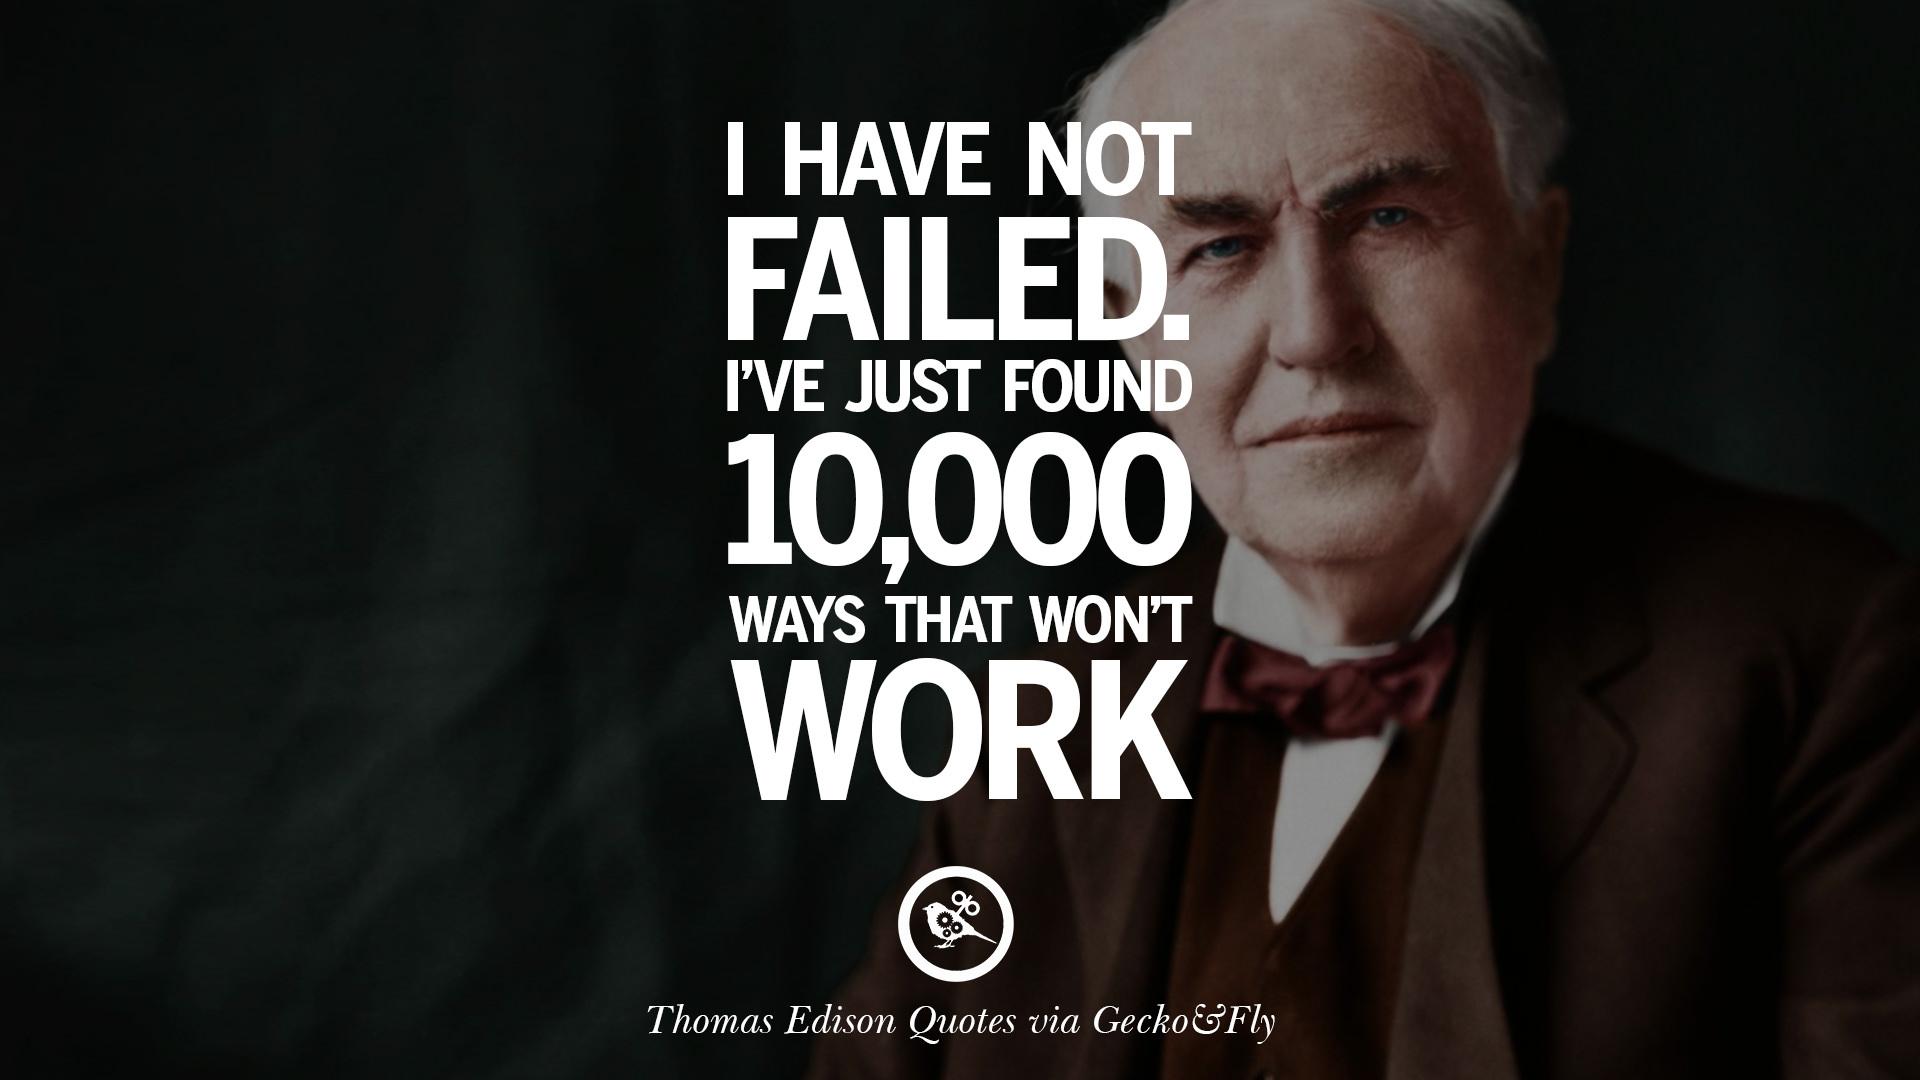 thomas edison citater 10 Empowering Quotes By Thomas Edison On Hard Work And Success thomas edison citater